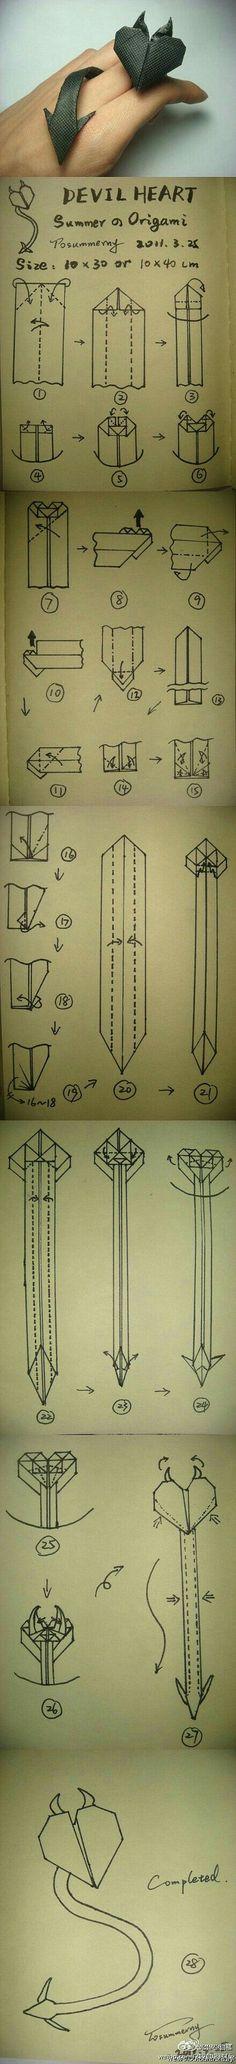 Devil heart💓 Instruções Origami, Origami Ball, Origami And Kirigami, Paper Crafts Origami, Heart Origami, Oragami, Origami Bookmark, Origami Hearts, Dollar Origami